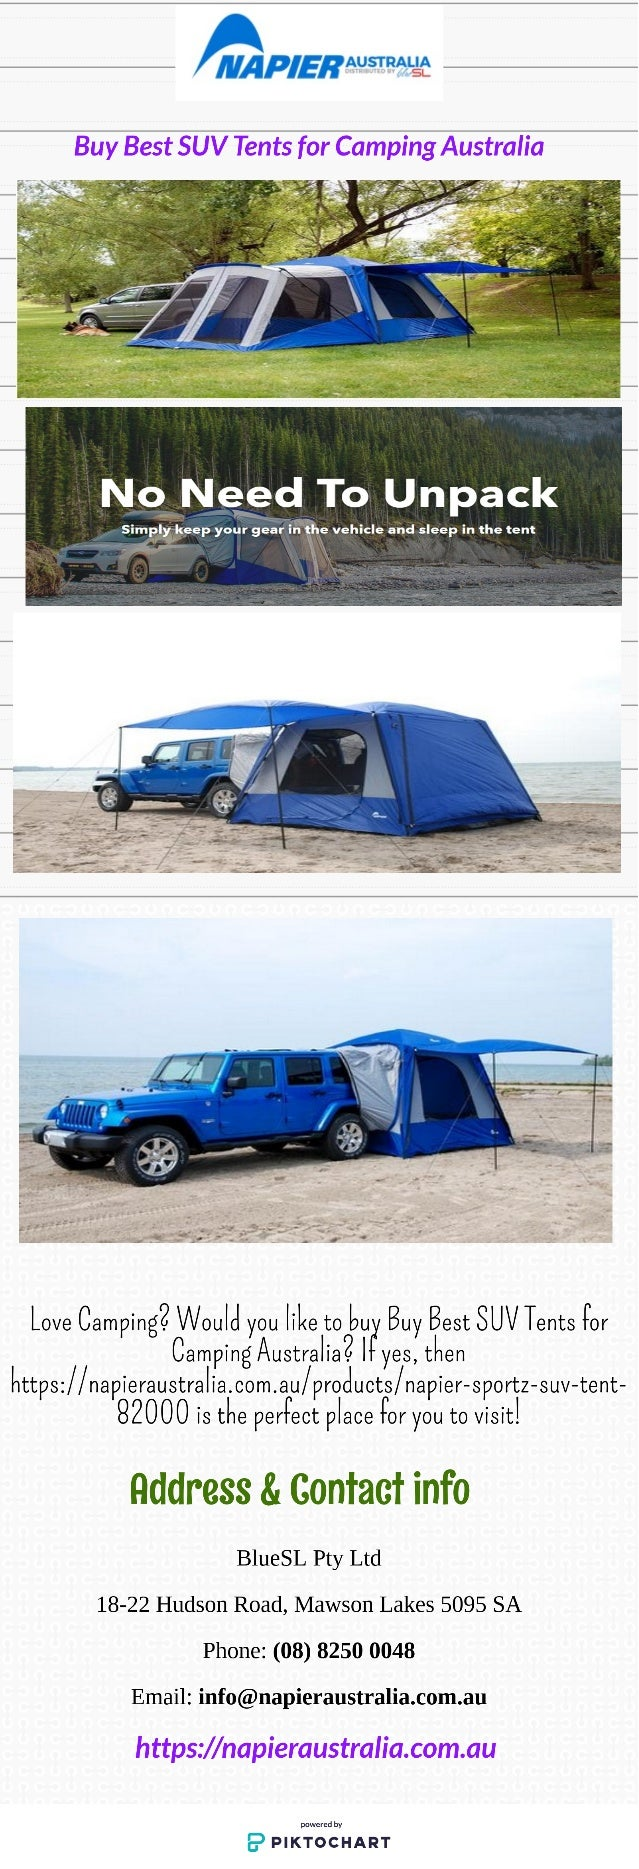 Buy Best Suv Tents For Camping Australia Napieraustralia Com Au